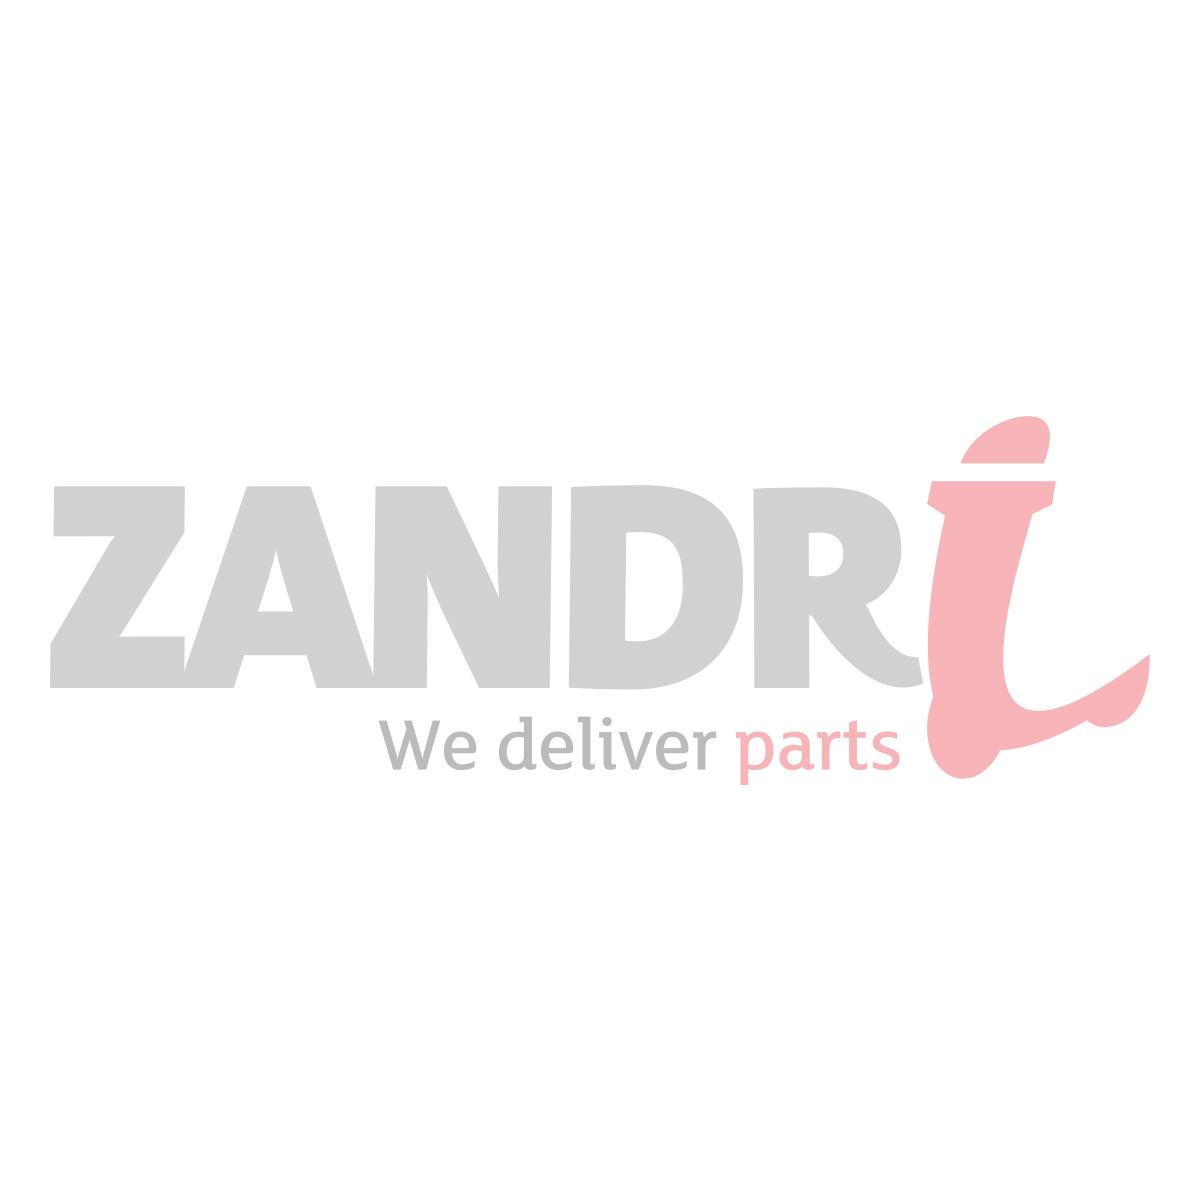 Gaskabel Piaggio Zip 4-Takt 2V 2006-2017 A-kwaliteit